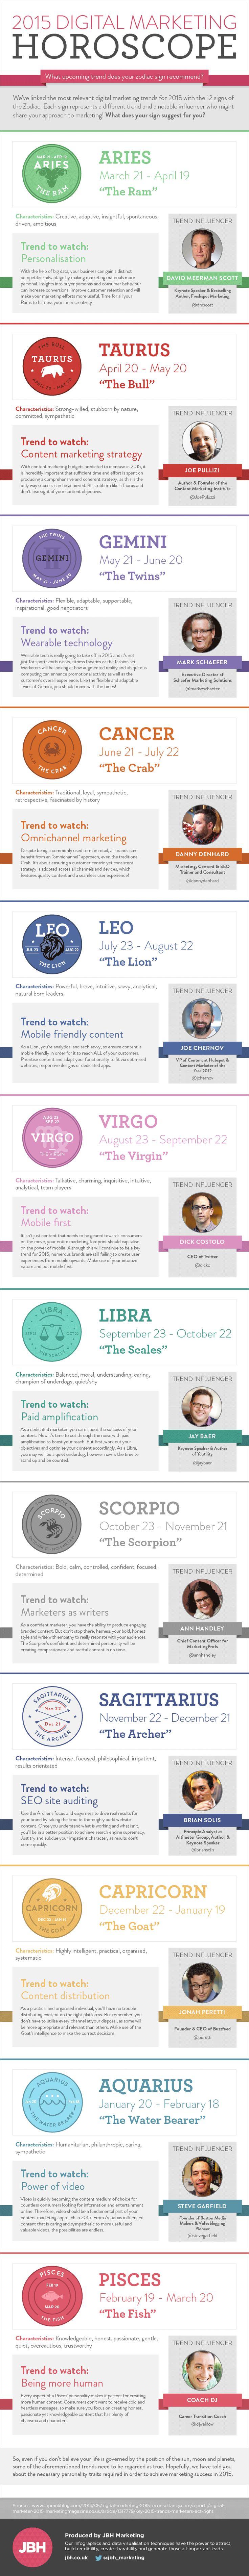 2015 Digital Marketing Horoscope Infographic